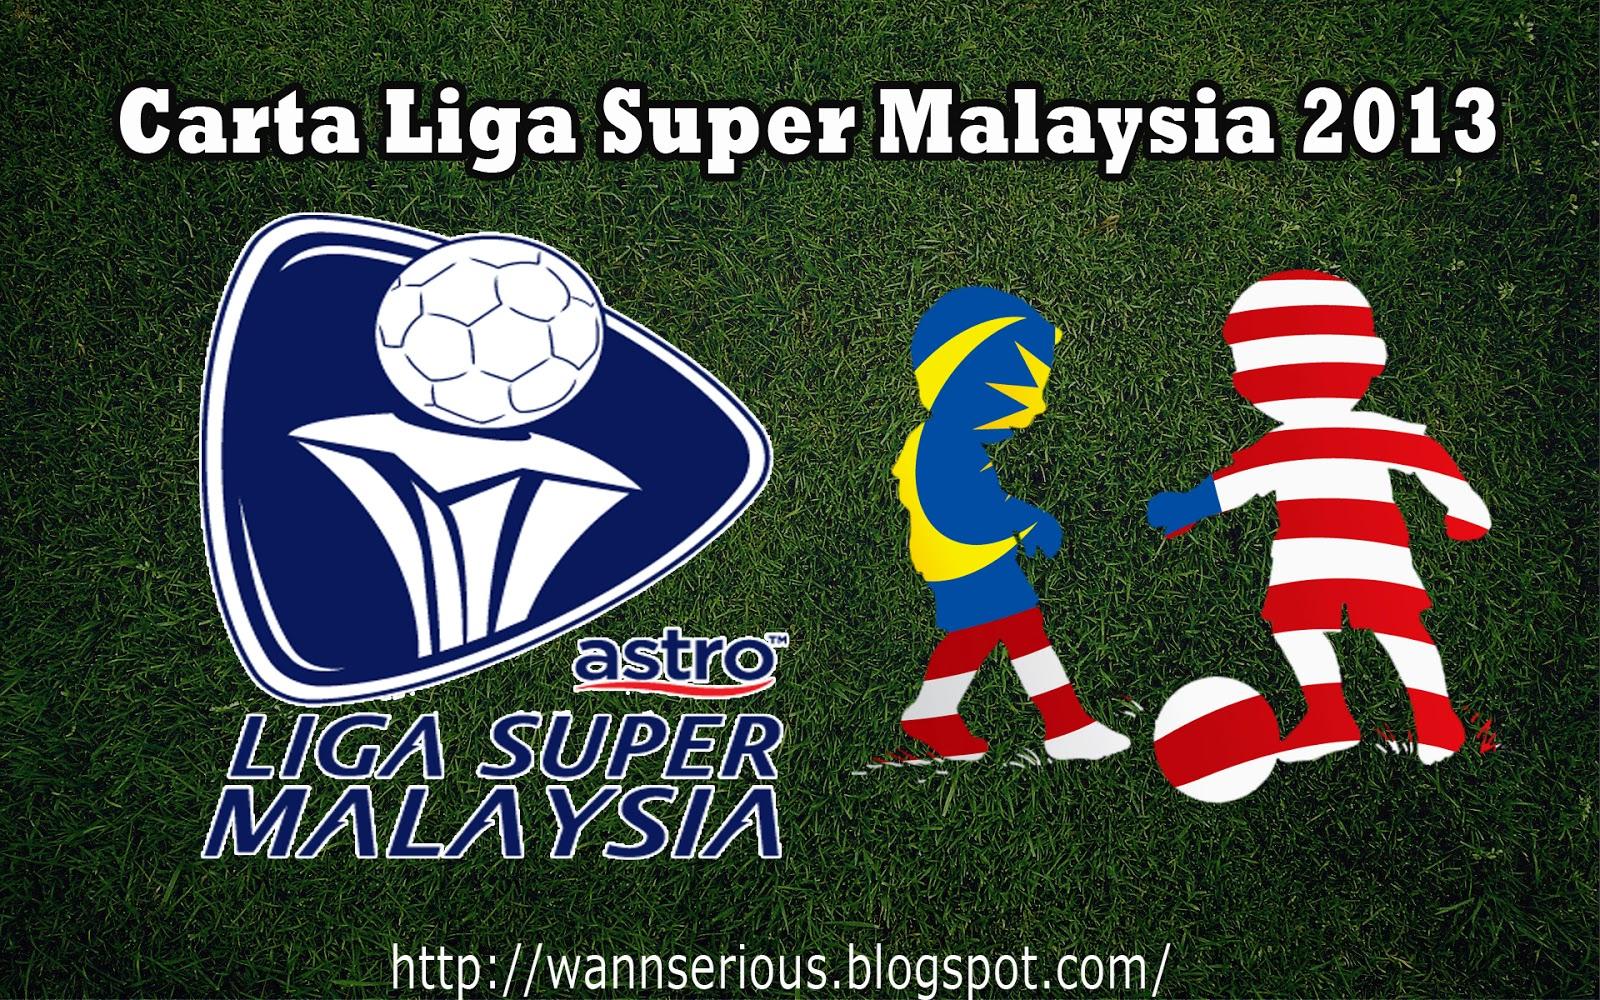 Liga Super Malaysia 2013 | Berikut merupakan carta liga terkini Liga